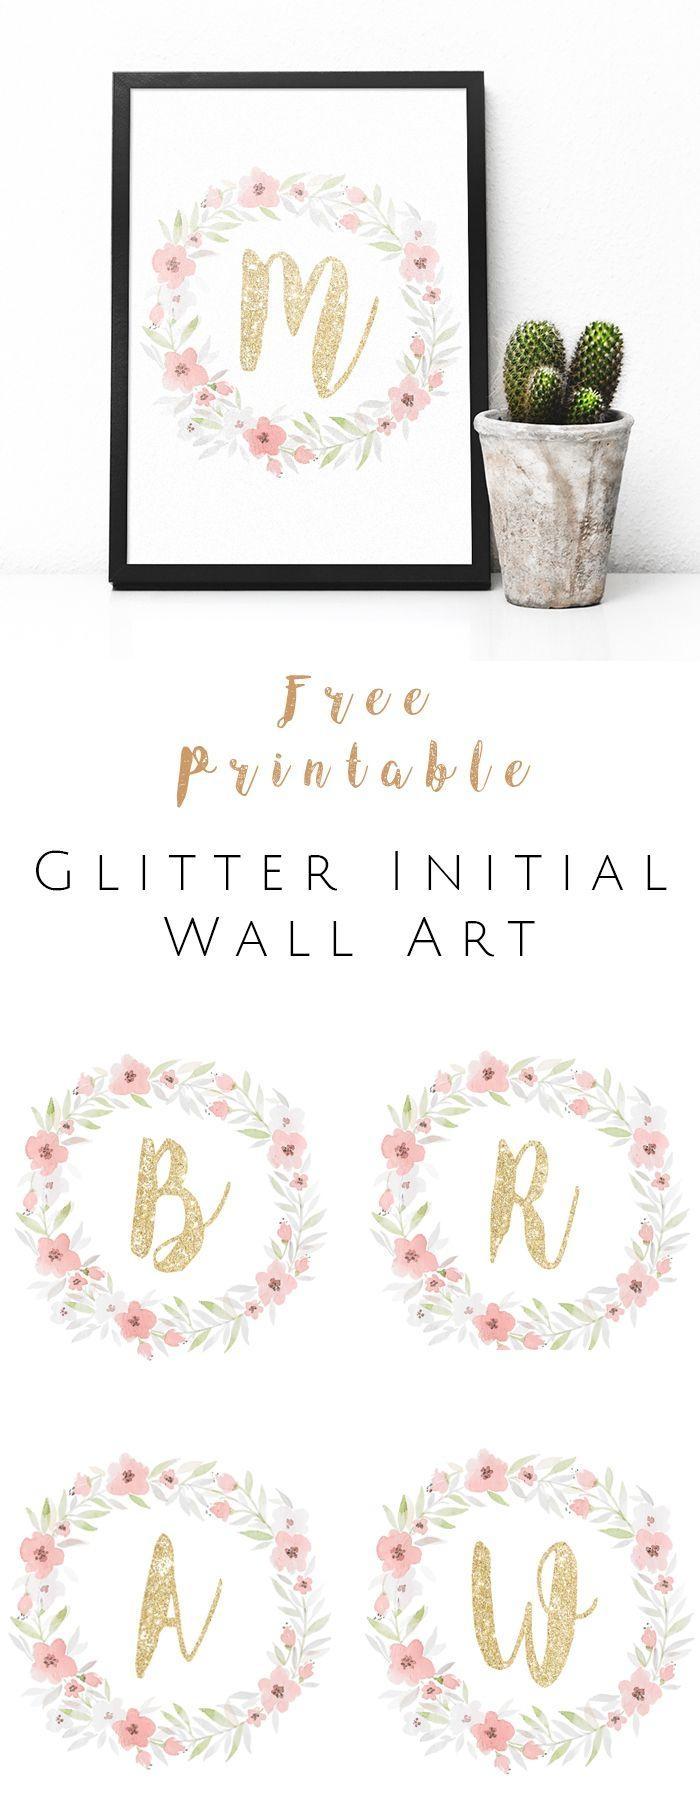 Best 25+ Wall Initials Ideas On Pinterest | Chevron Girls Bedrooms Regarding Decorative Initials Wall Art (Image 4 of 20)